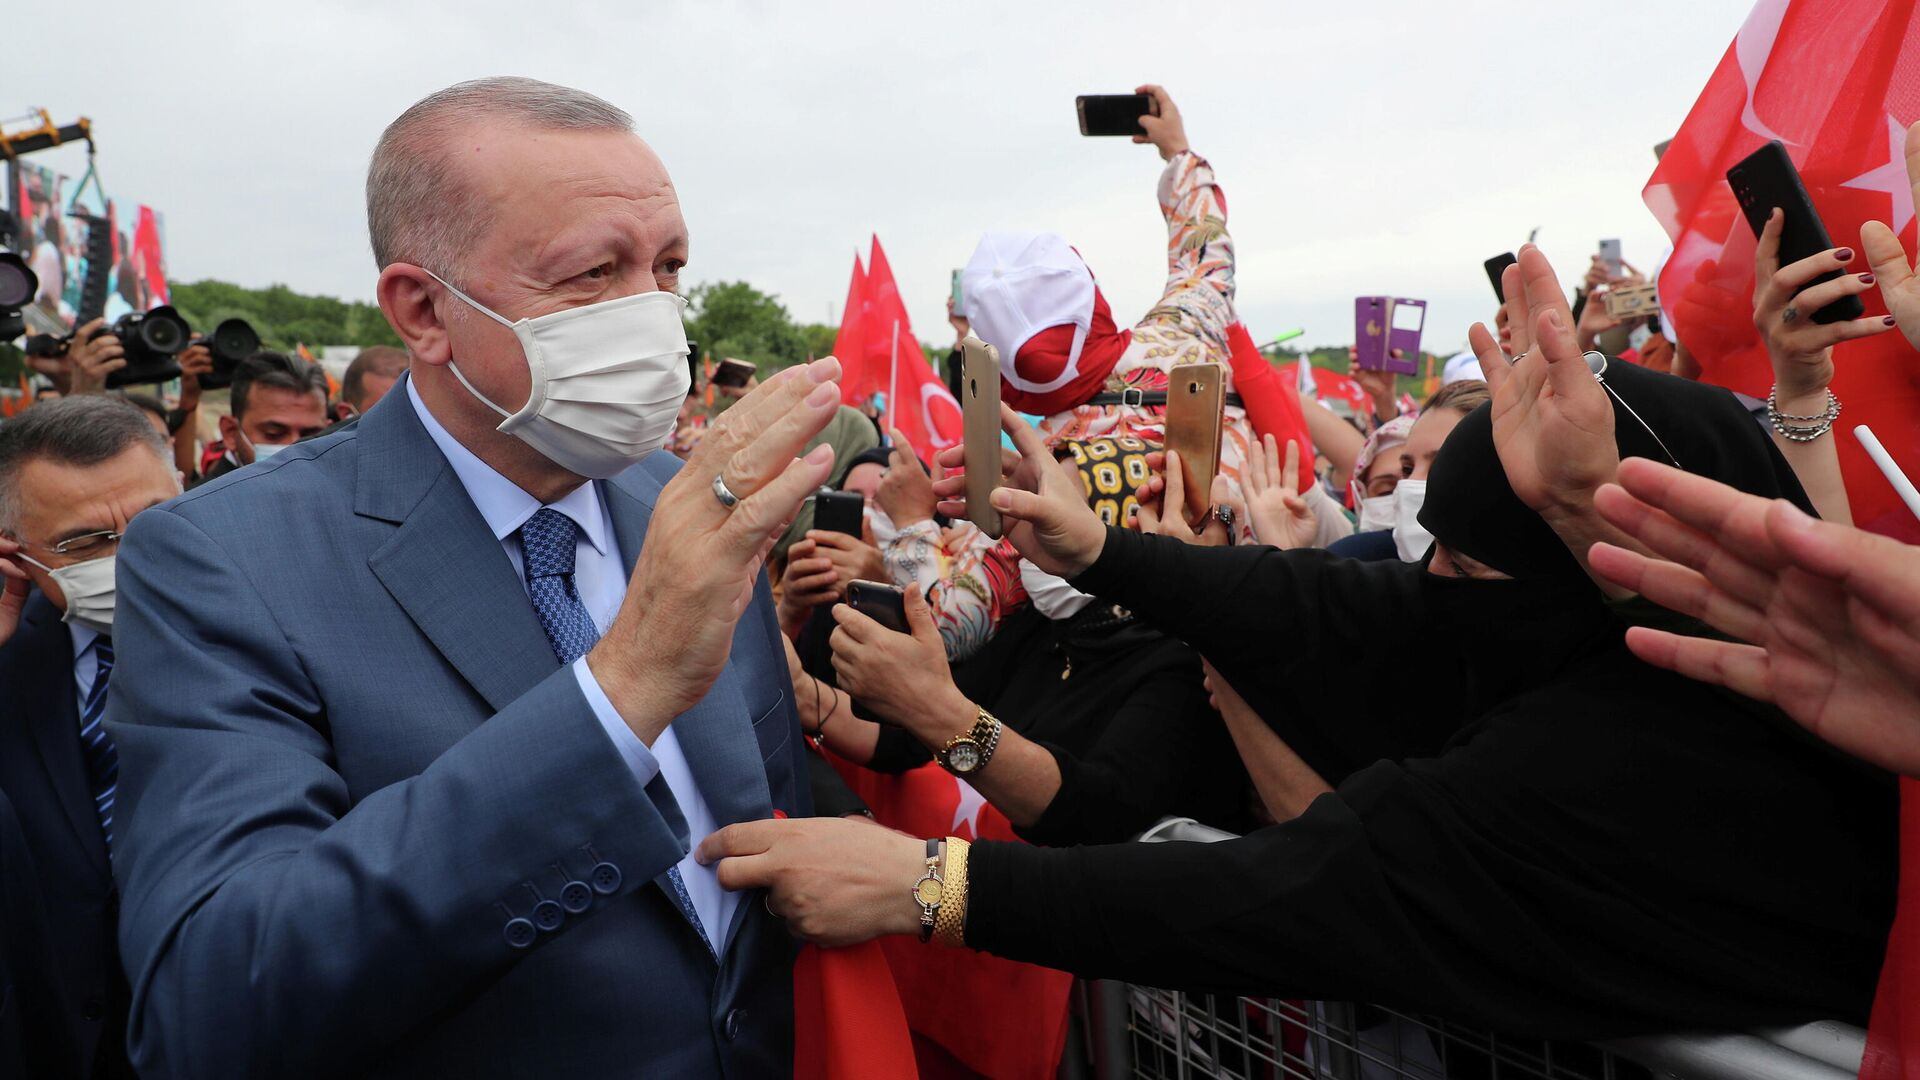 Президент Турции Реджеп Тайип Эрдоган перед началом церемонии начала строительства канала Стамбул - РИА Новости, 1920, 29.06.2021